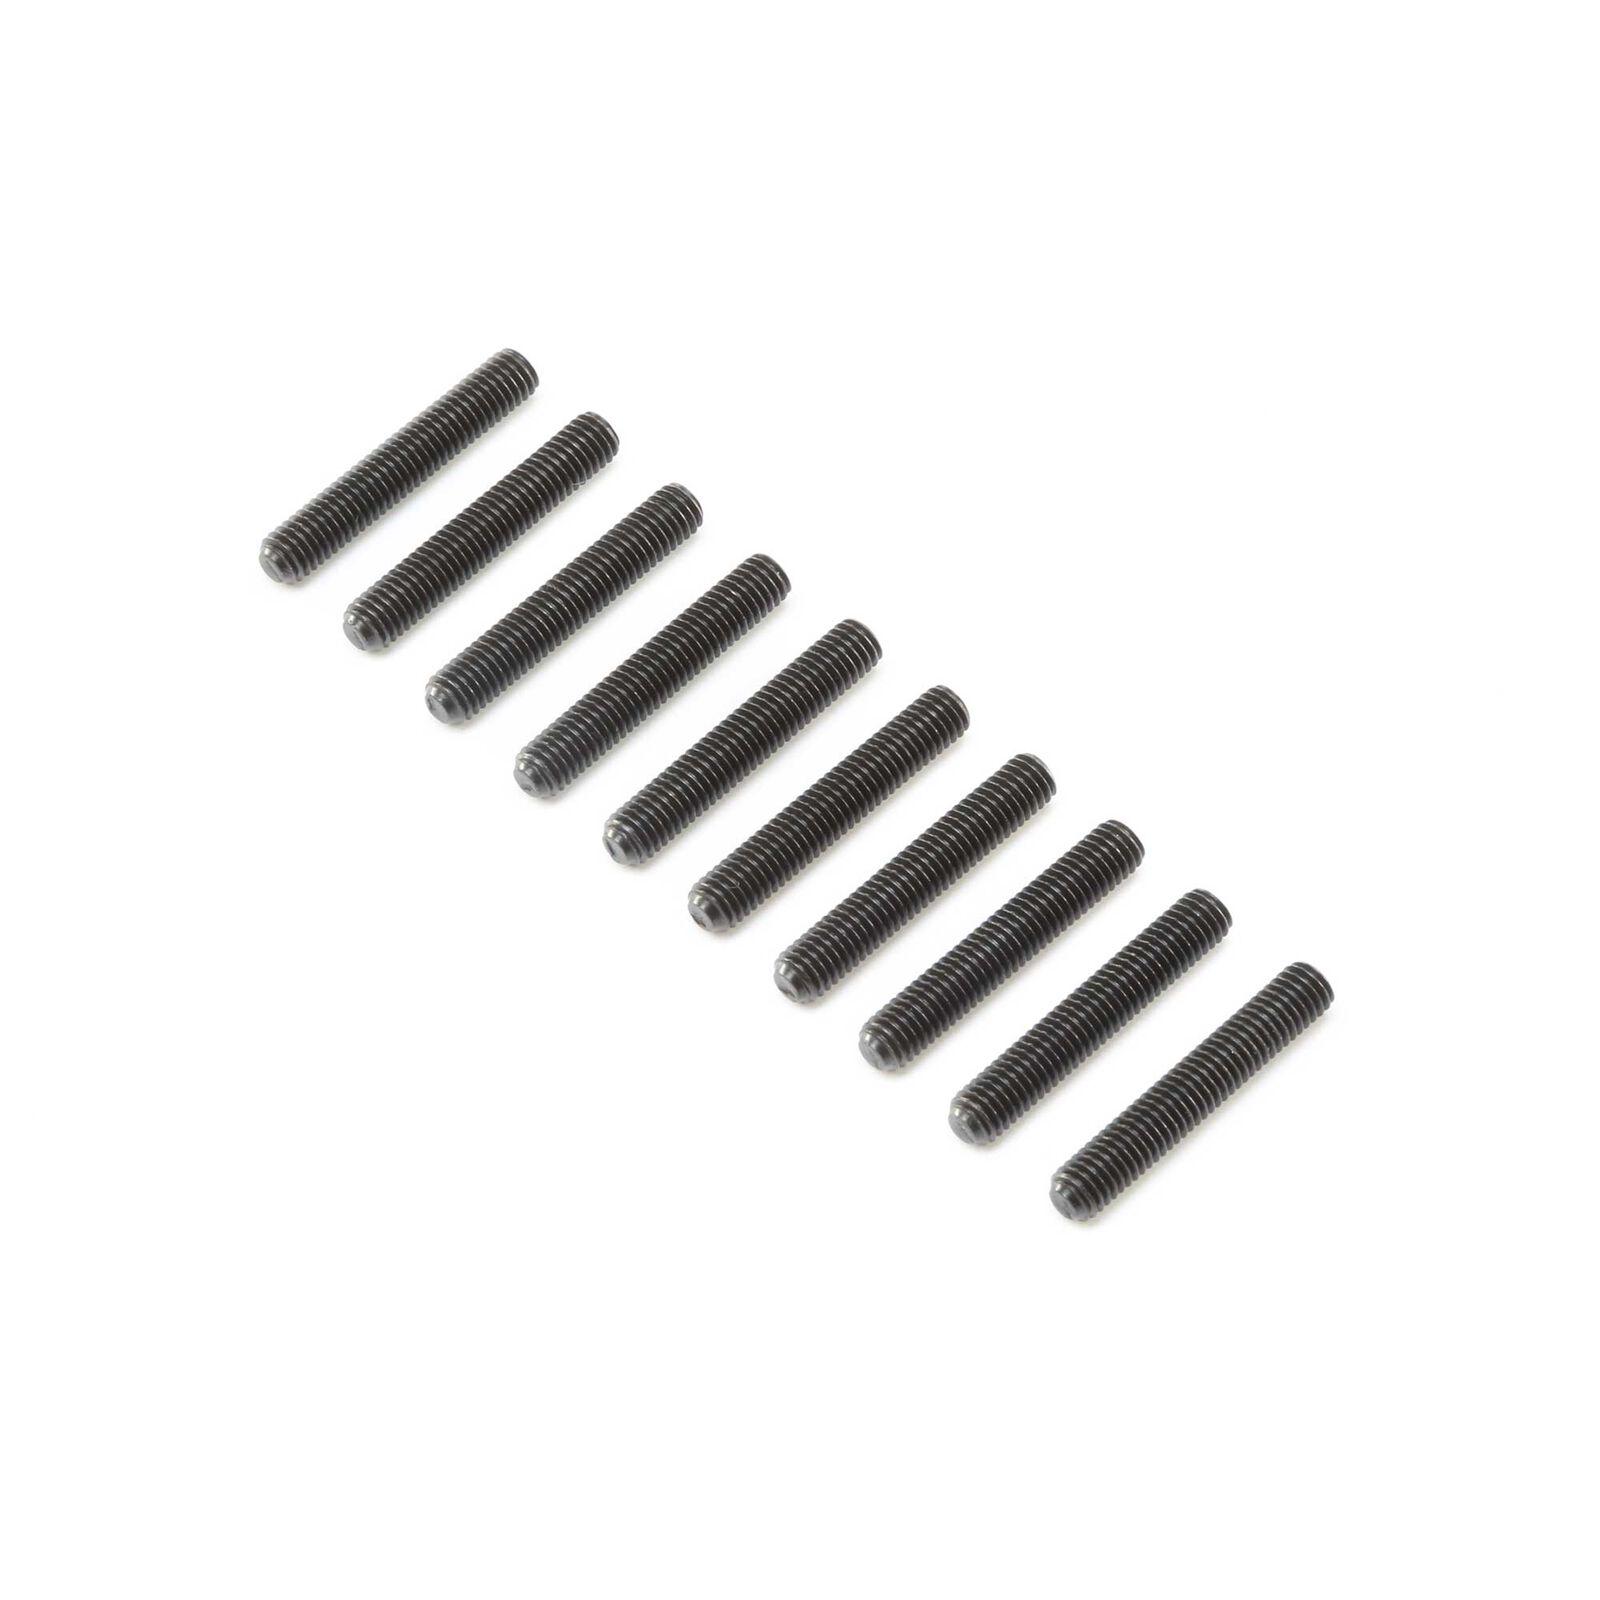 Set Screws, Steel, Black Oxide, Flat Point, M5 x 30mm (10)